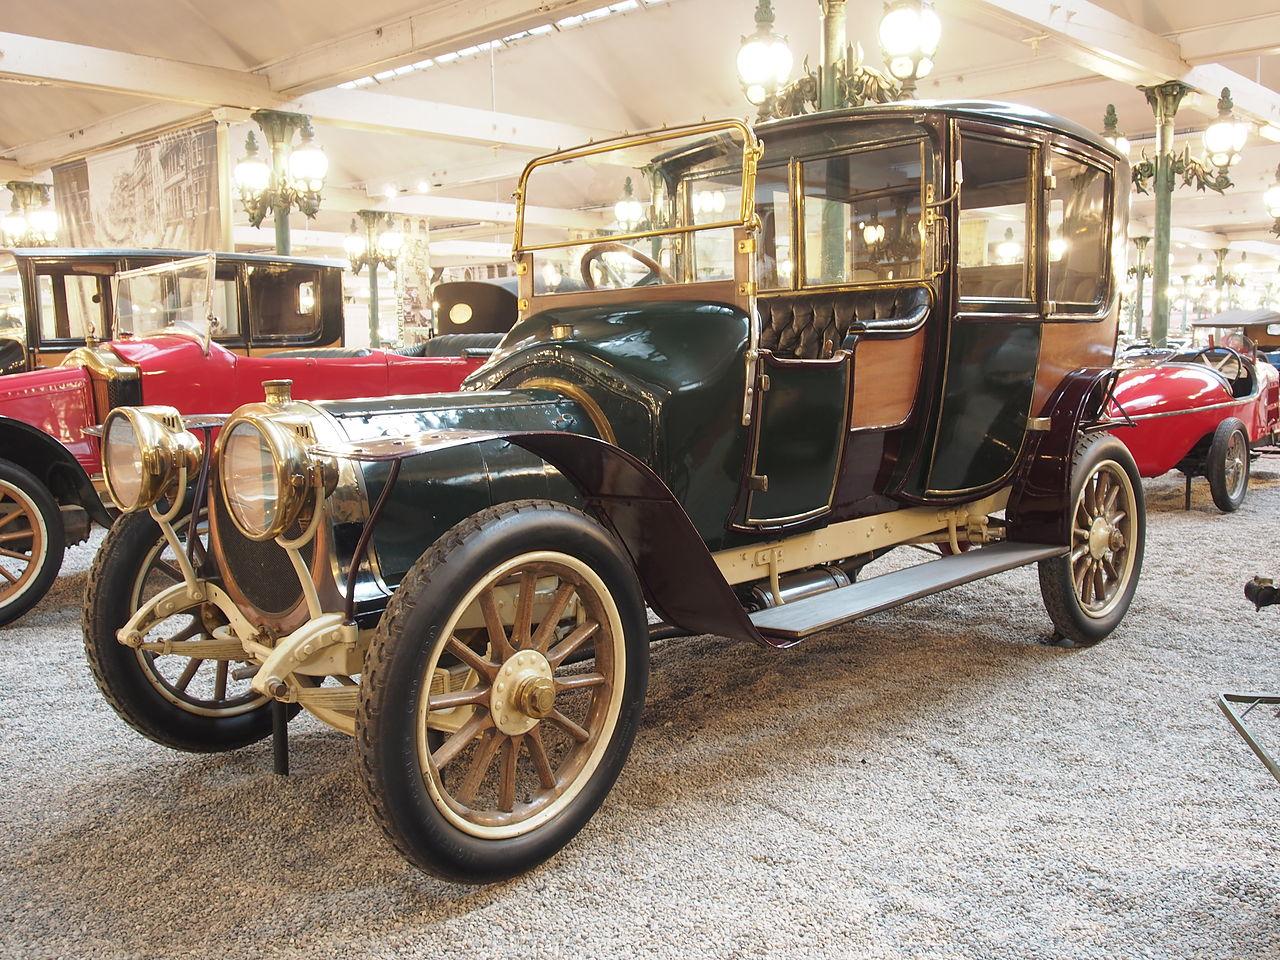 fichier 1912 delaunay belleville coup chauffeur hb6 6 cylinder 21hp 4423cm3 70kmh photo 2. Black Bedroom Furniture Sets. Home Design Ideas